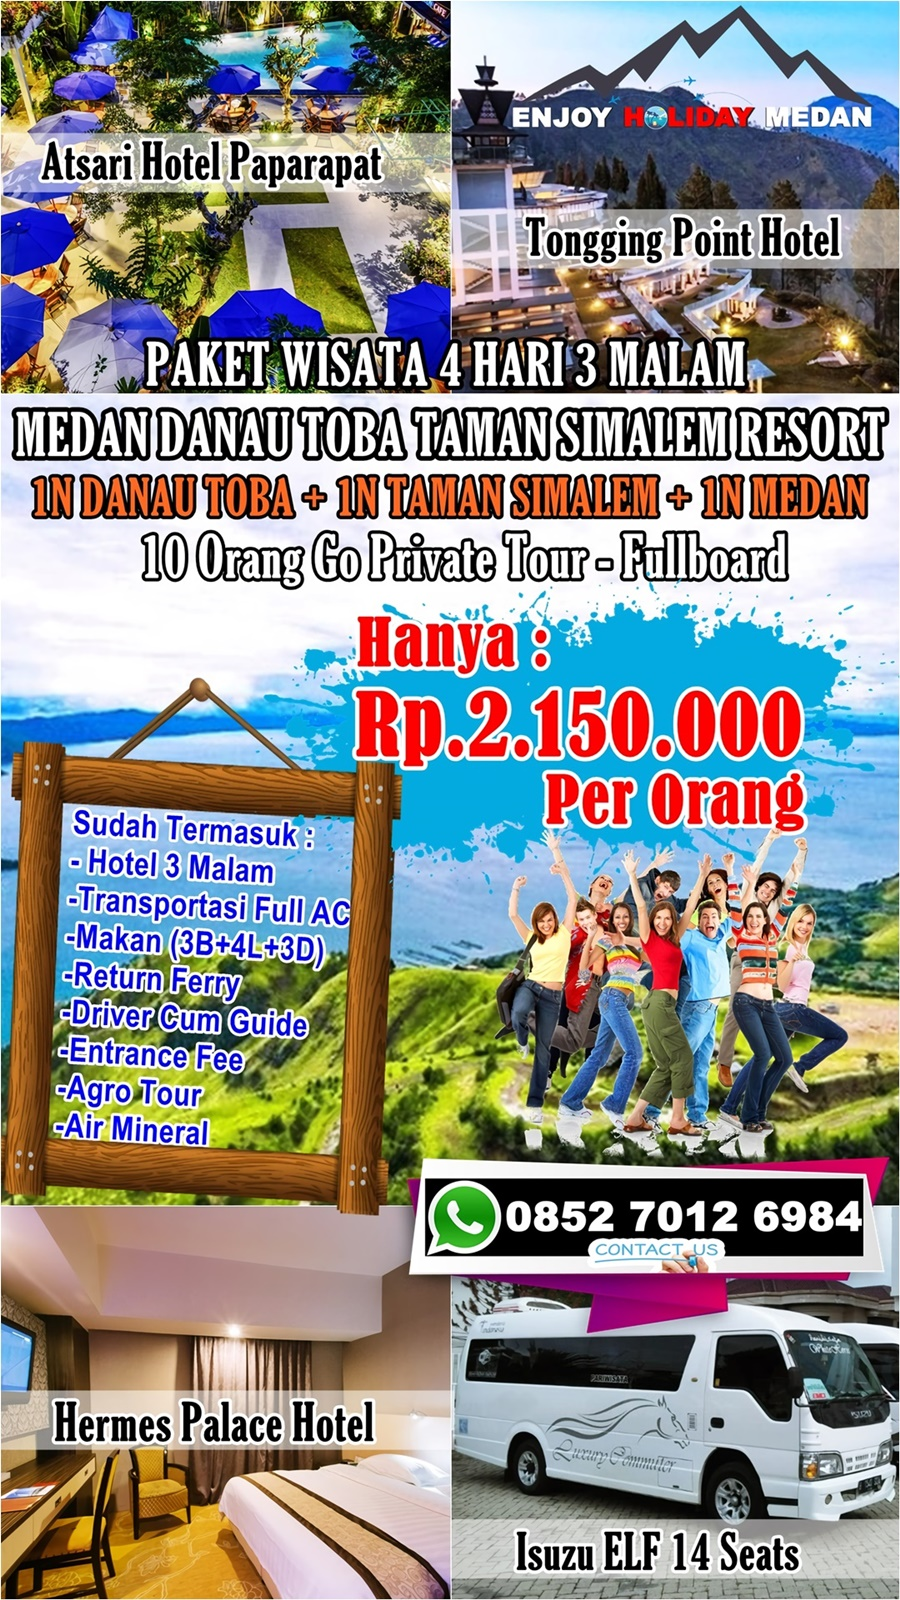 4D3N Medan Honeymoon Taman Simalem